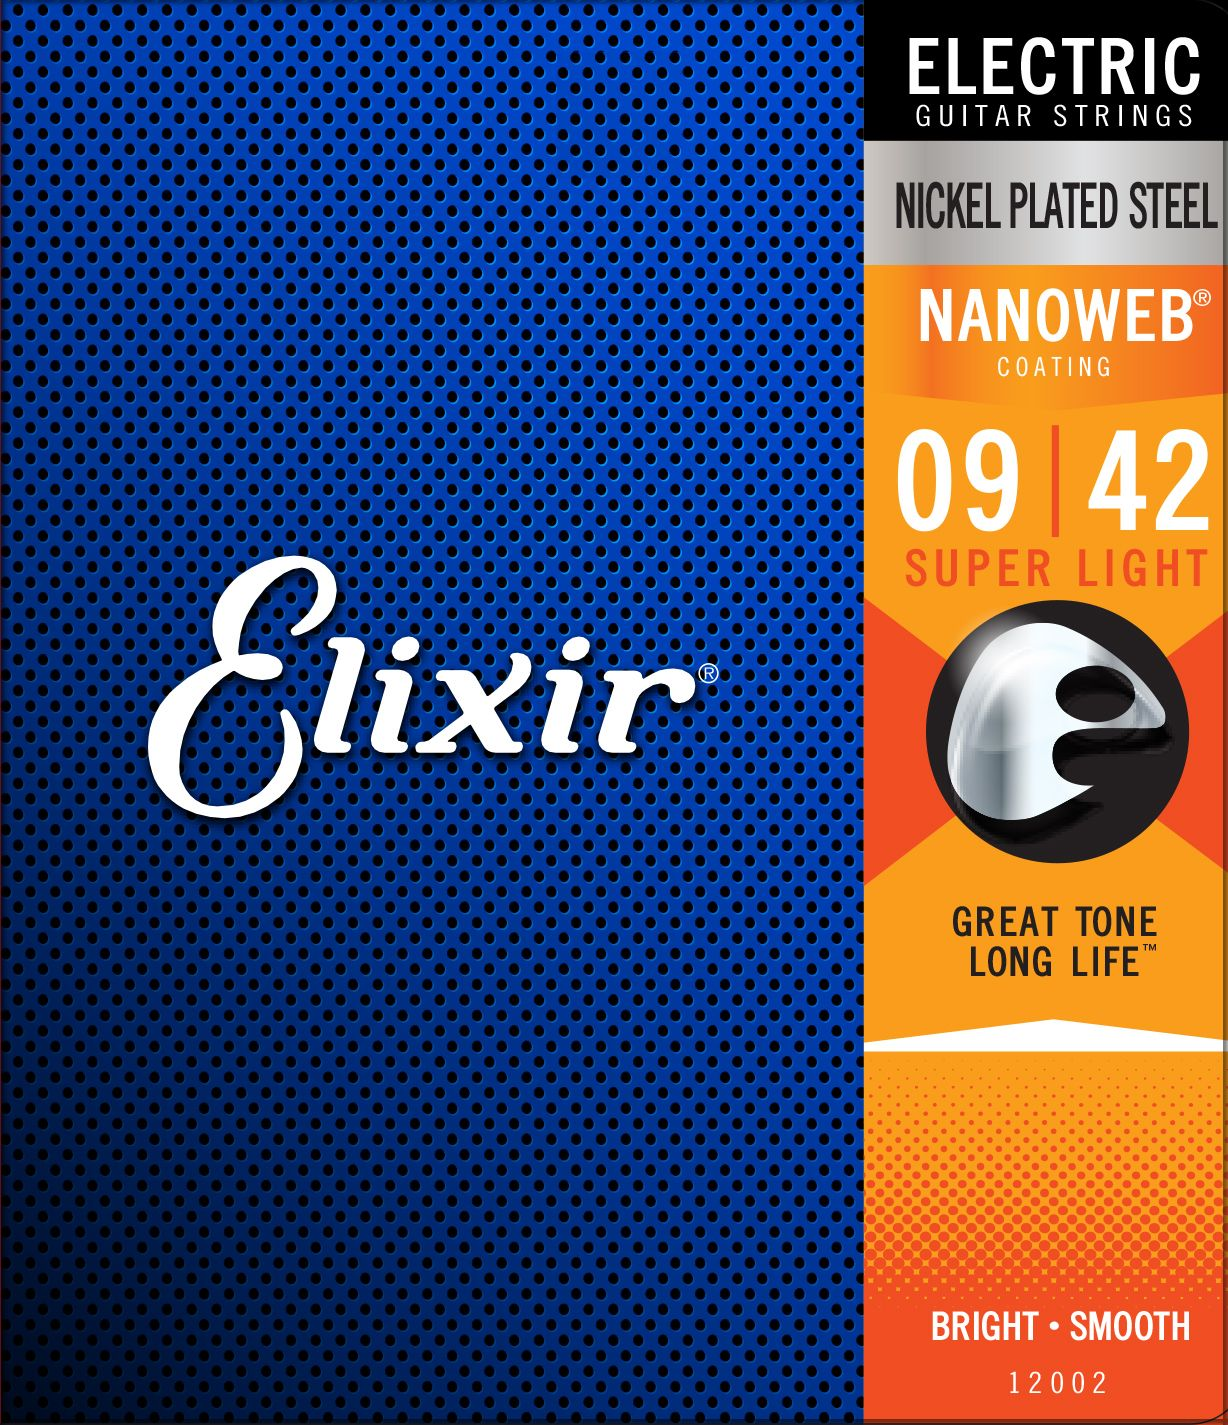 Elixir Nanoweb Super Light 09-42